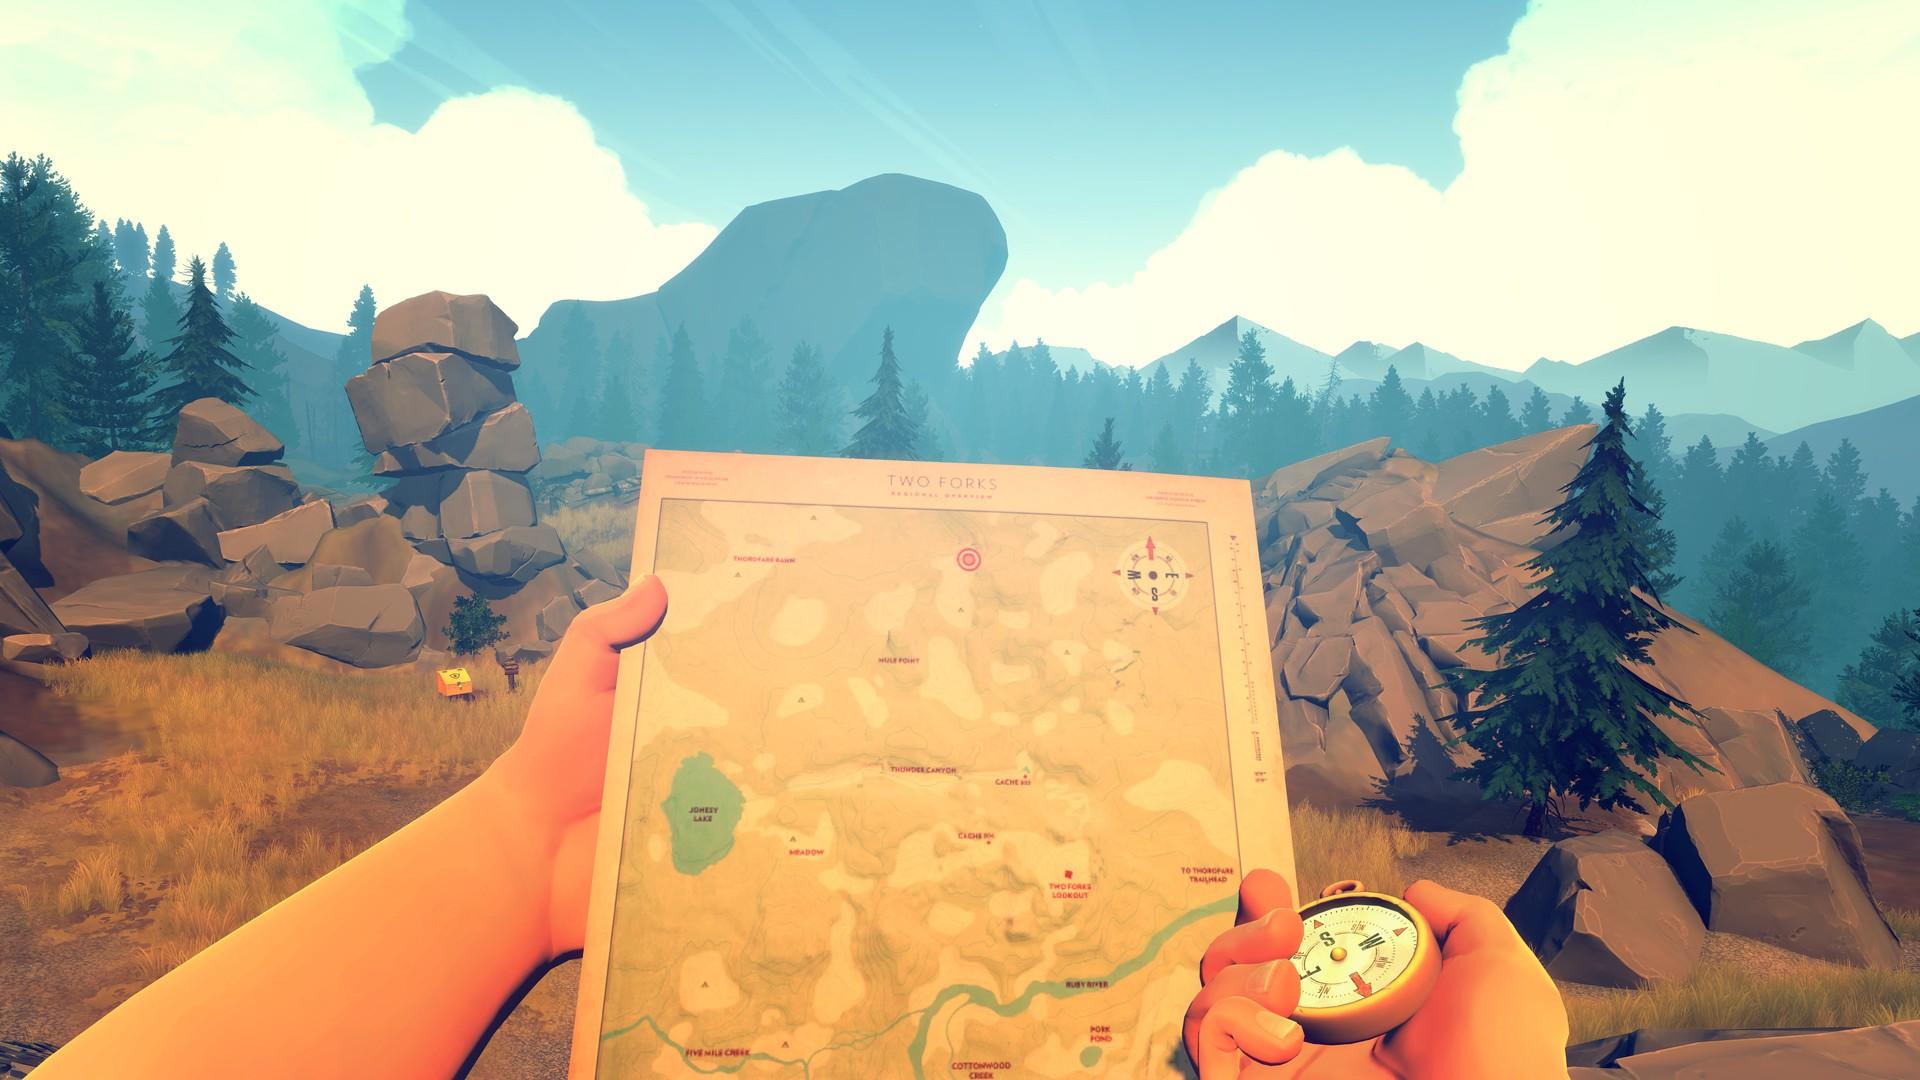 firewatch wallpaper,sky,adventure game,illustration,anime,animation